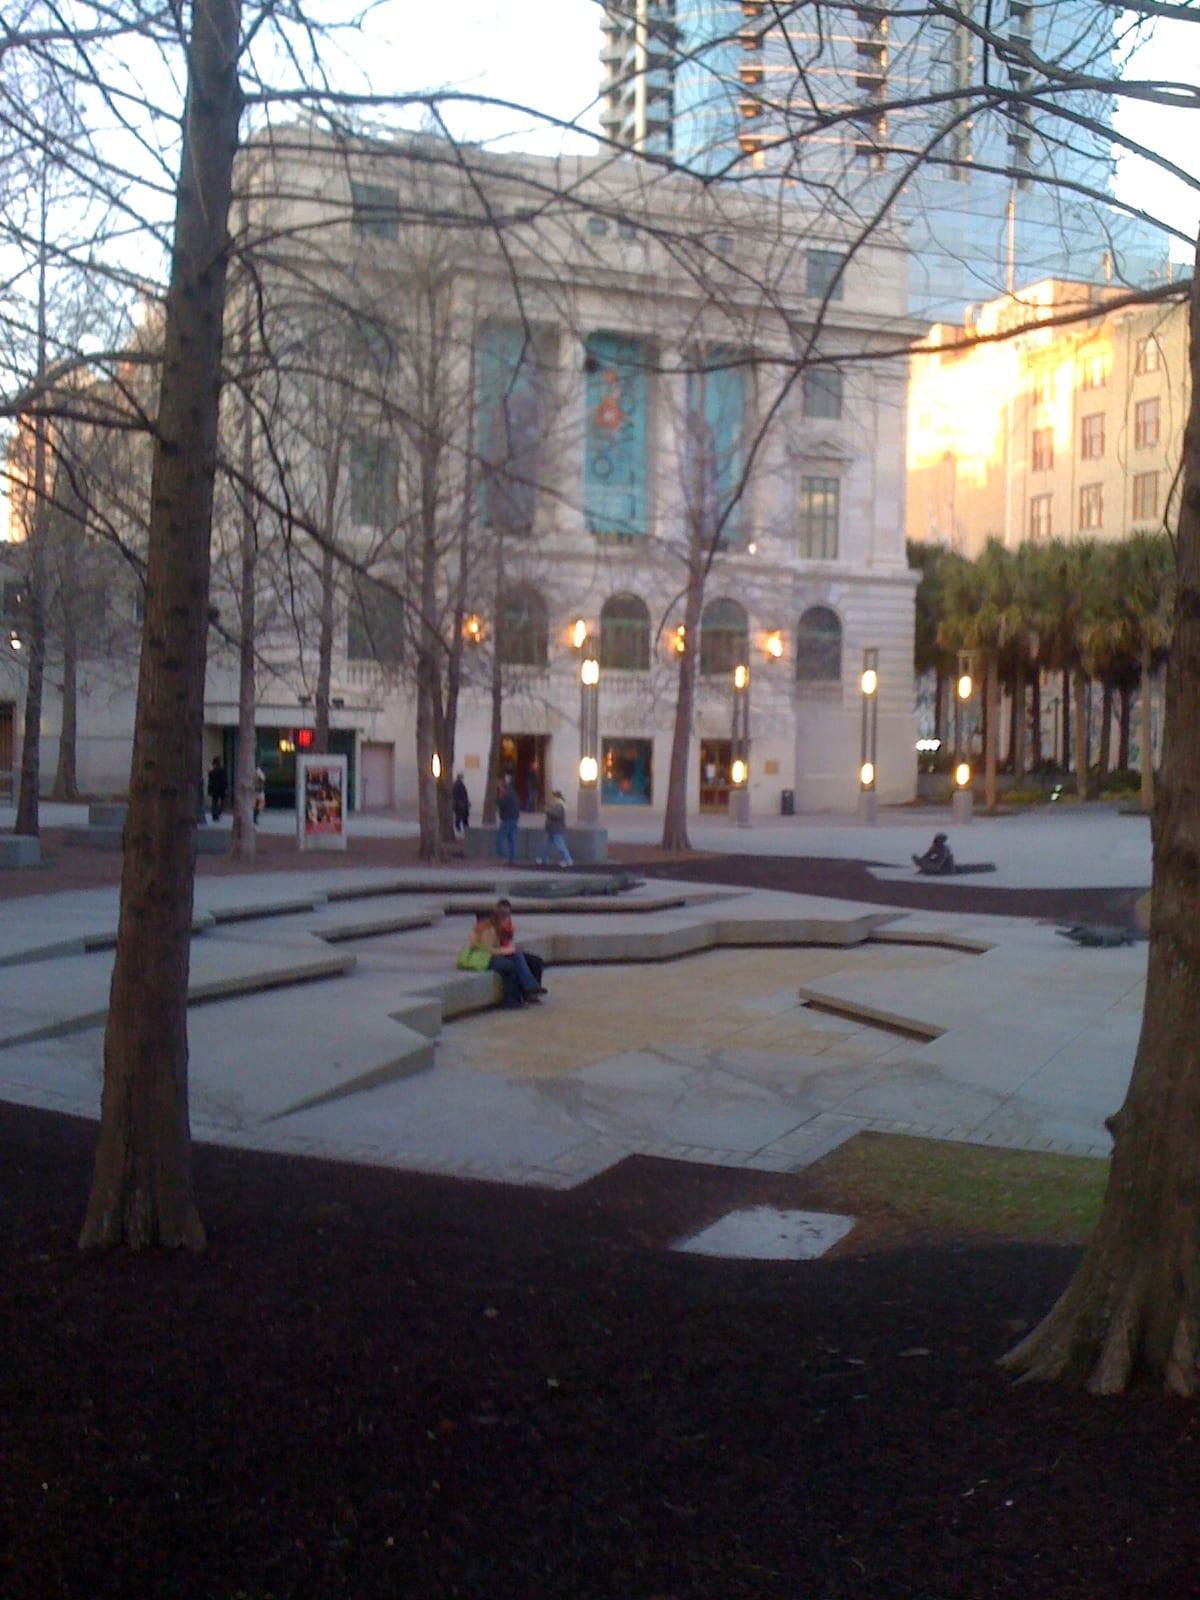 Orlando Museum - First Orlando Courthouse